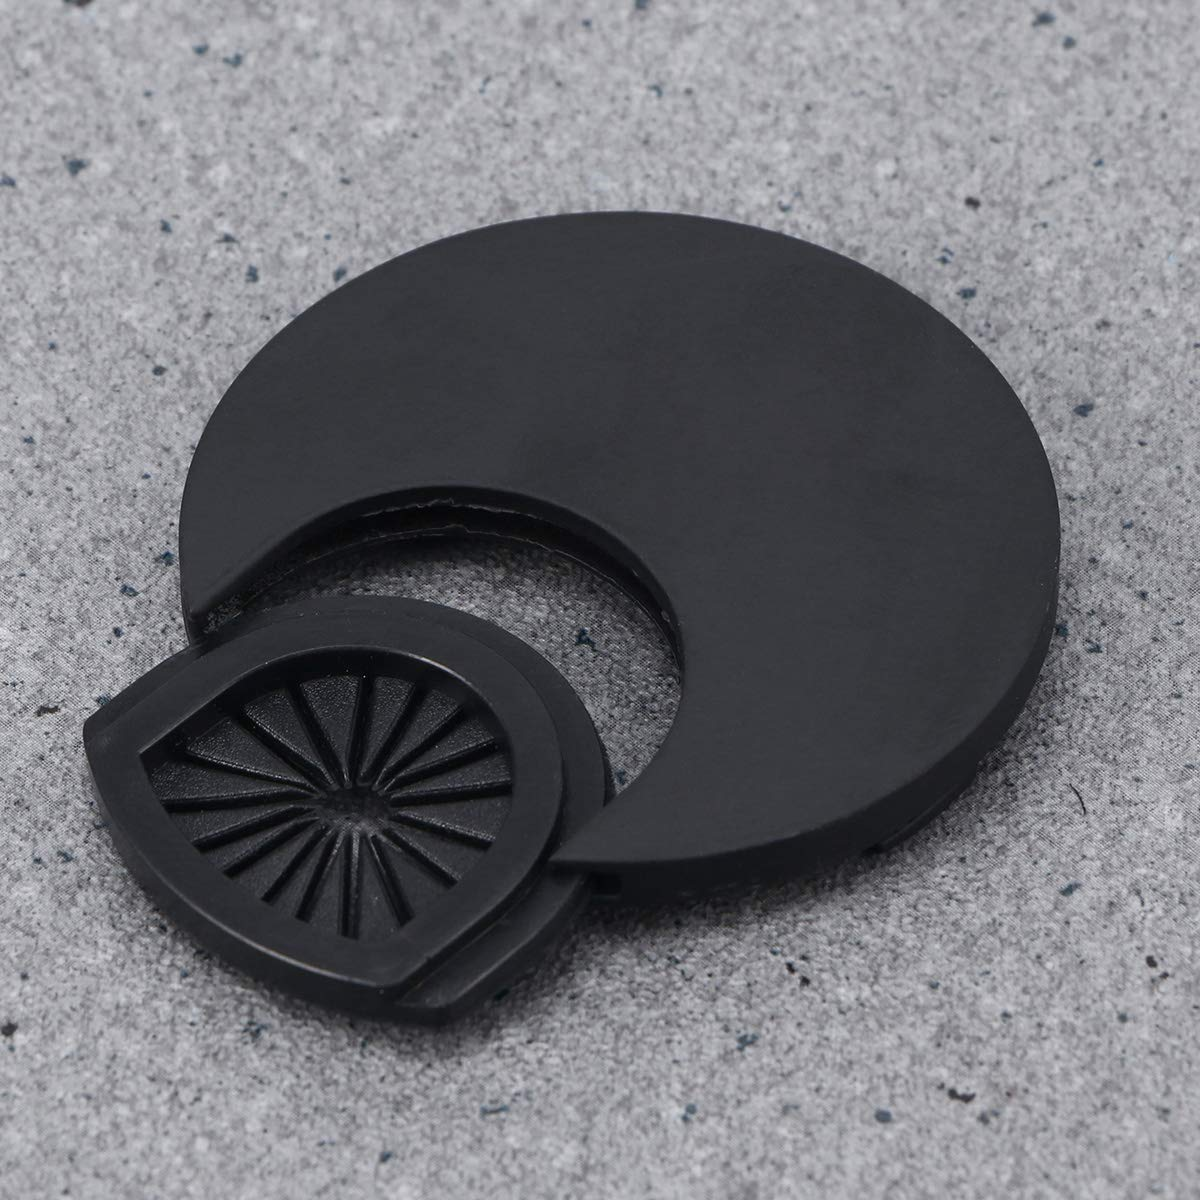 Negro 2pcs Yardwe Pasacables de Escritorio de Plastico Di/ámetro 60mm para Encastrar en Escritorio o Mesa para Oeganizador de Cables de Ordenador de Oficina